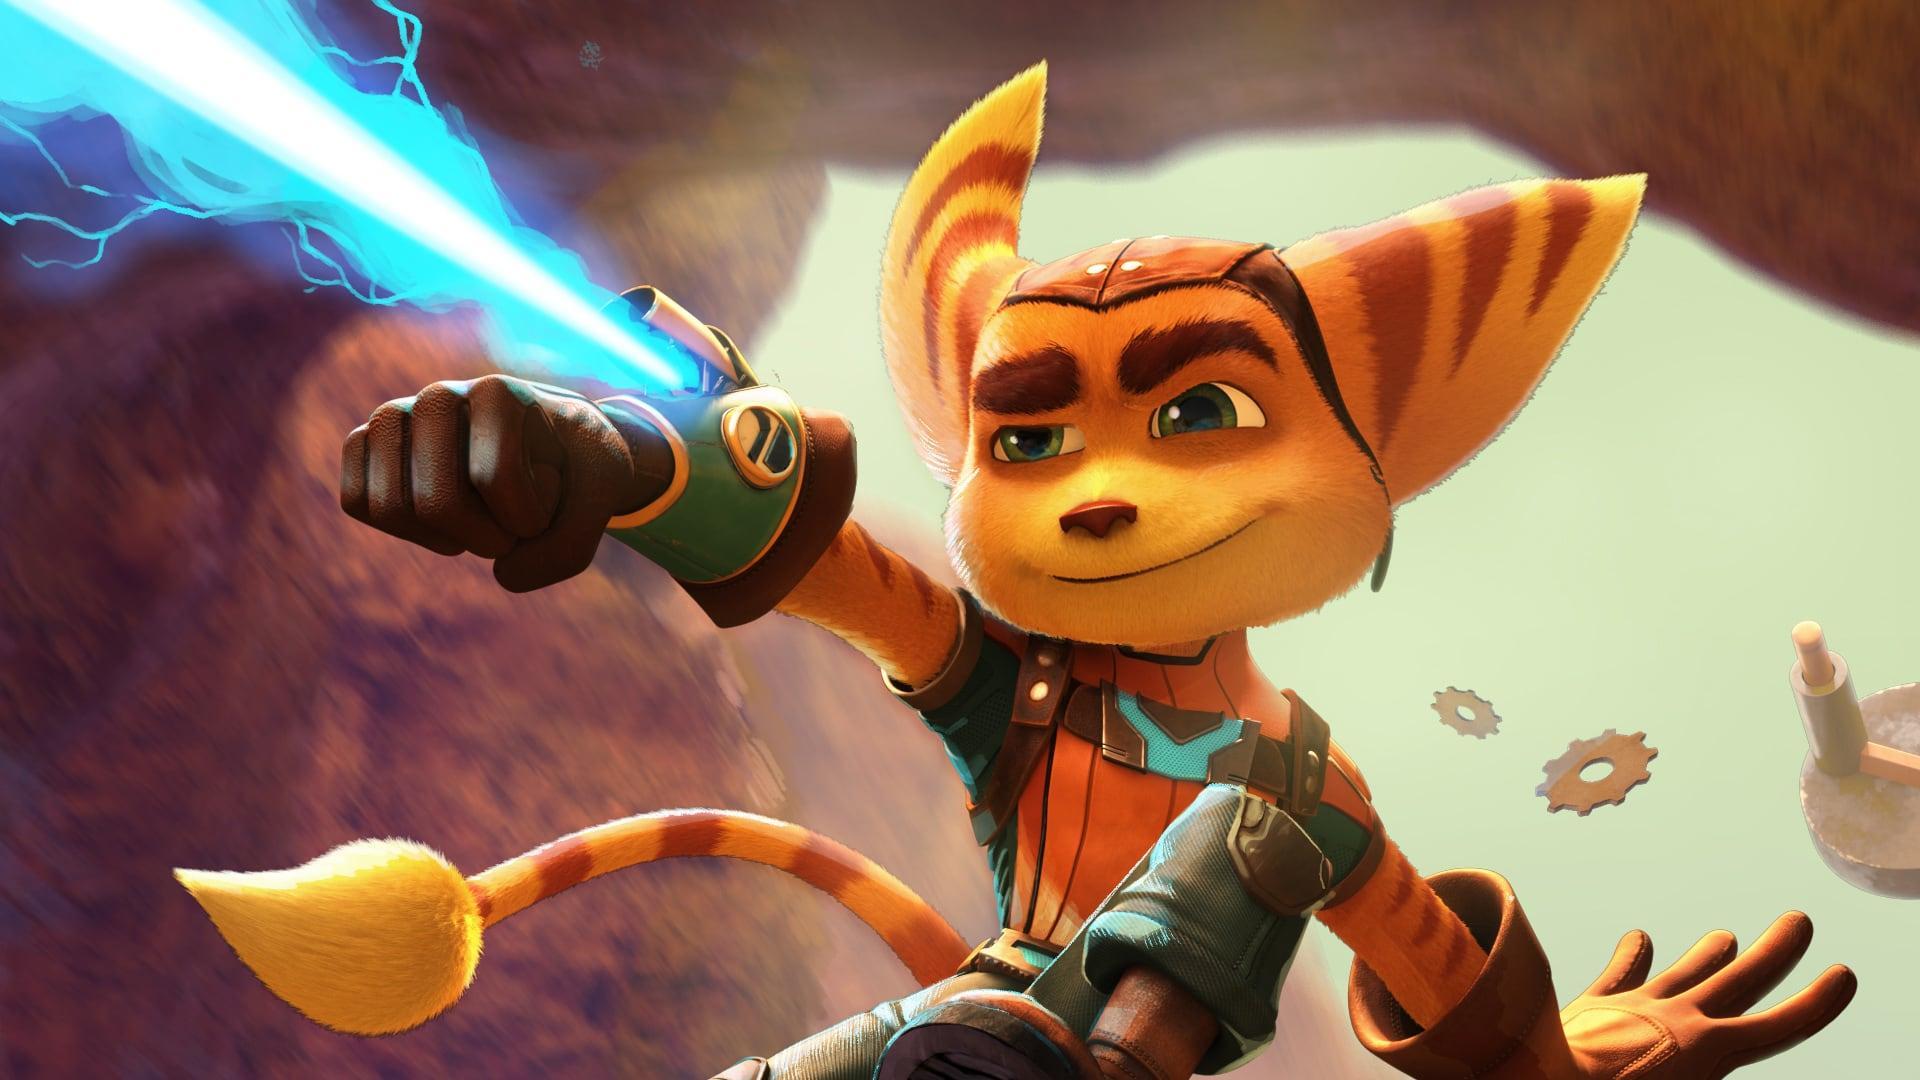 Ratchet & Clank (2016) получит обновление и 60FPS на PS5 2